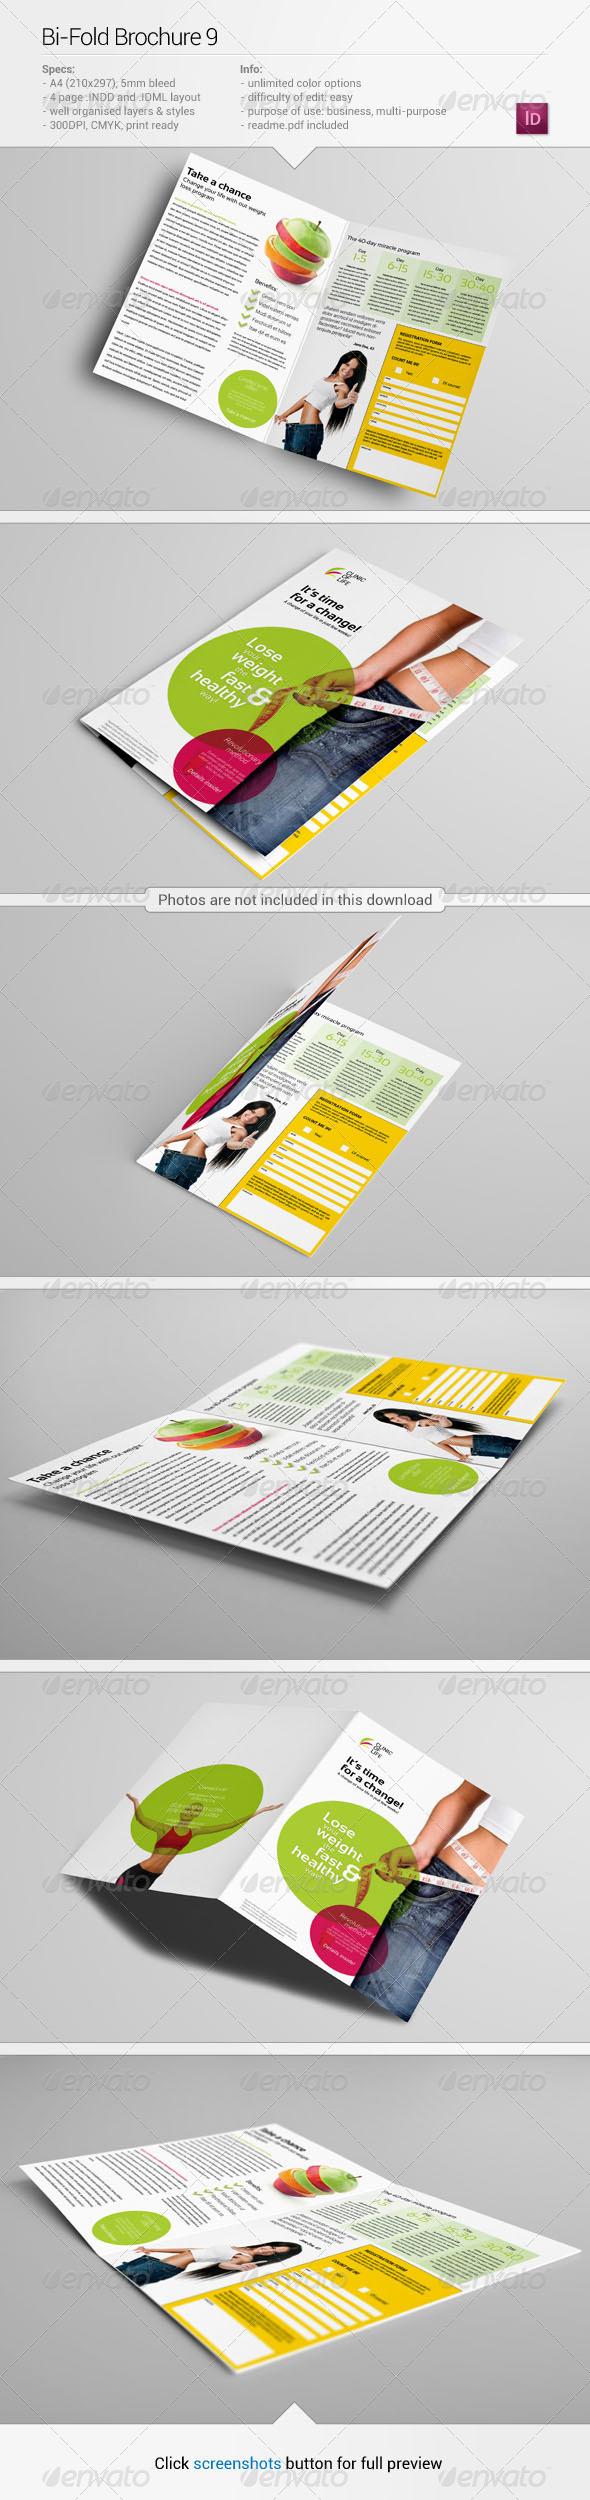 GraphicRiver Bi-Fold Brochure 9 5443375